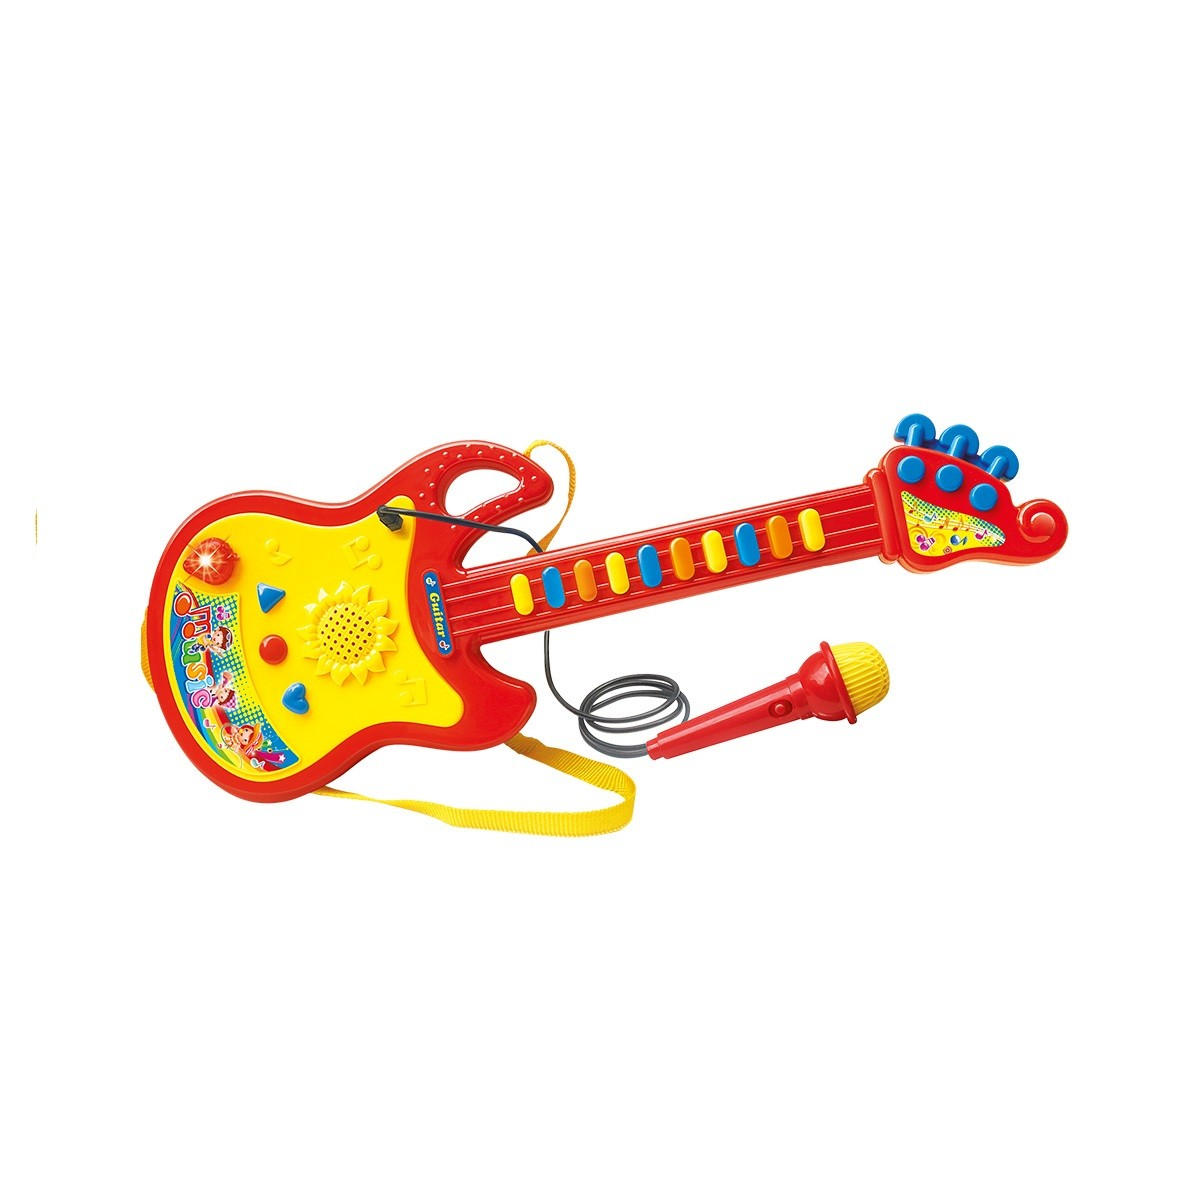 Brinquedo Infantil GUITARRA COM MICRIFONE DM TOYS DMT5379